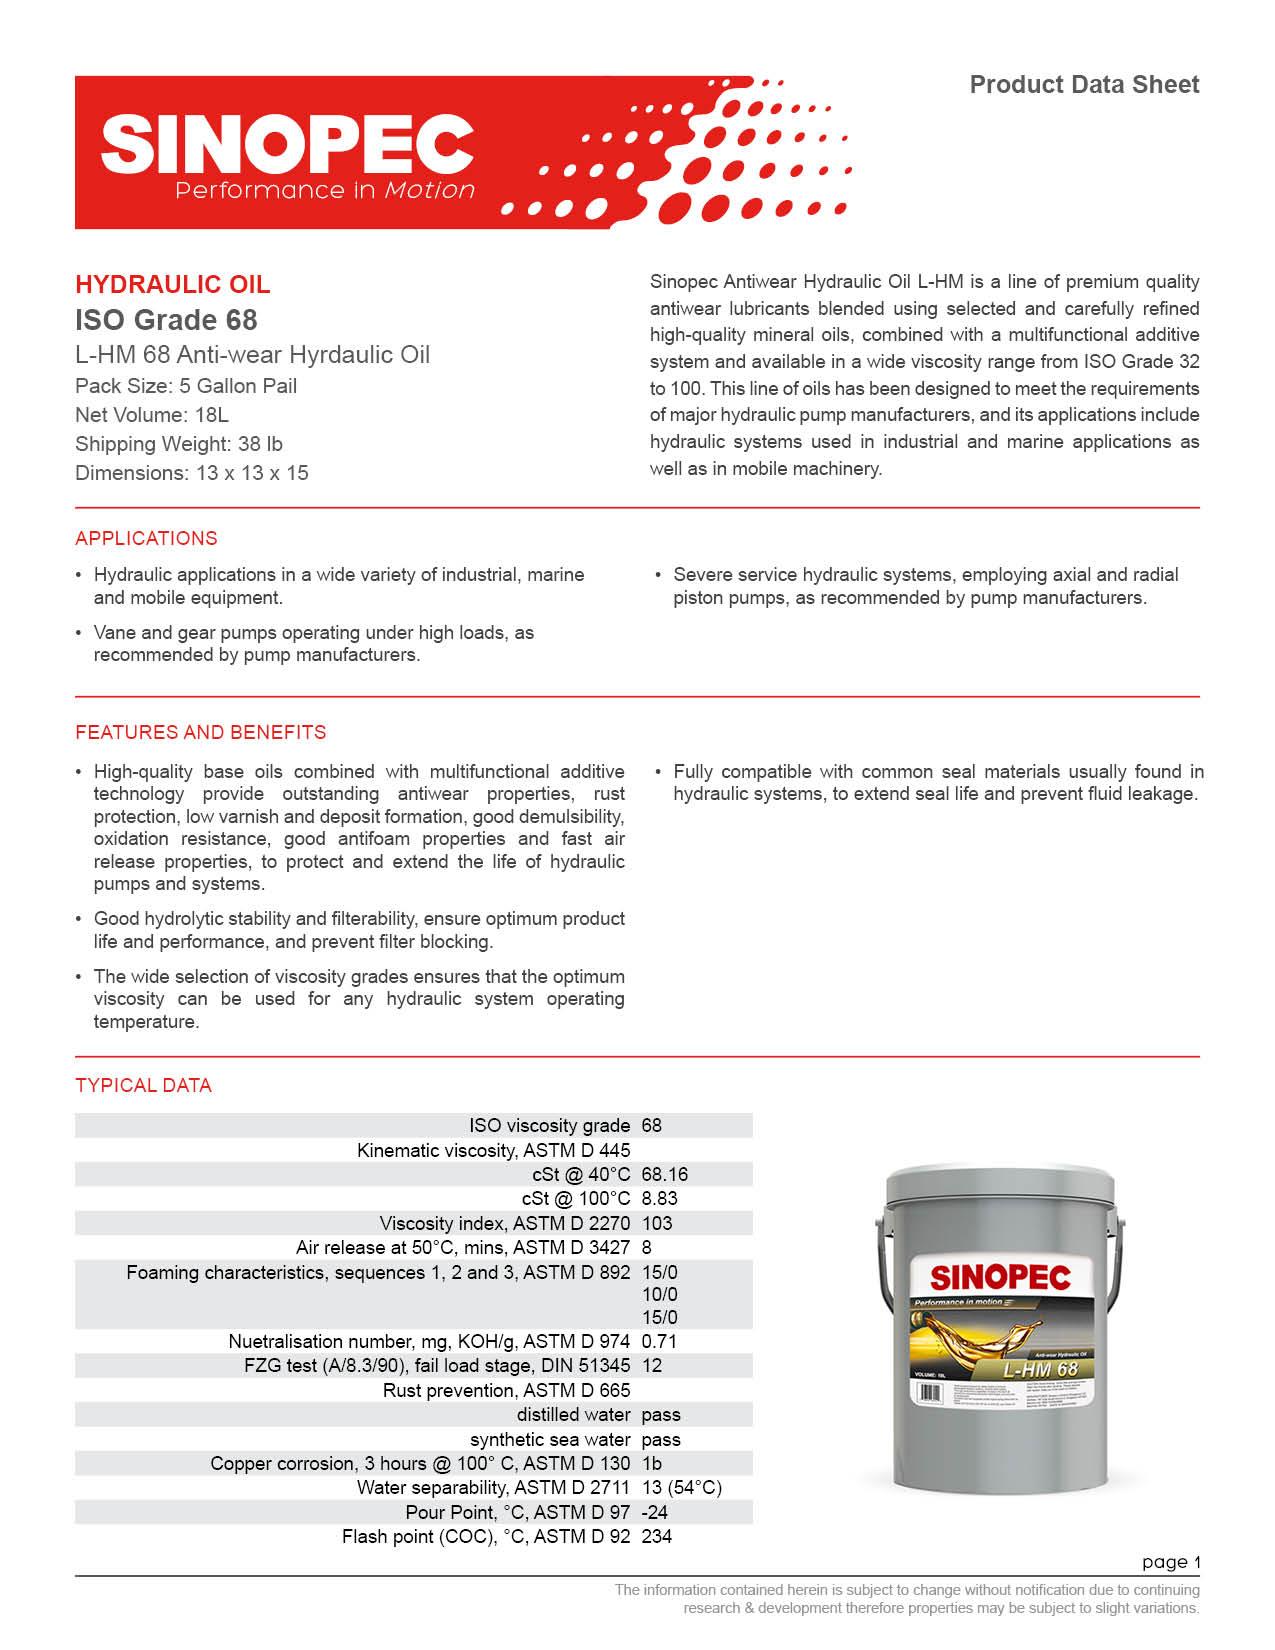 AW 68 Hydraulic Oil Fluid (ISO VG 68, SAE 20), 5 Gallon Pail